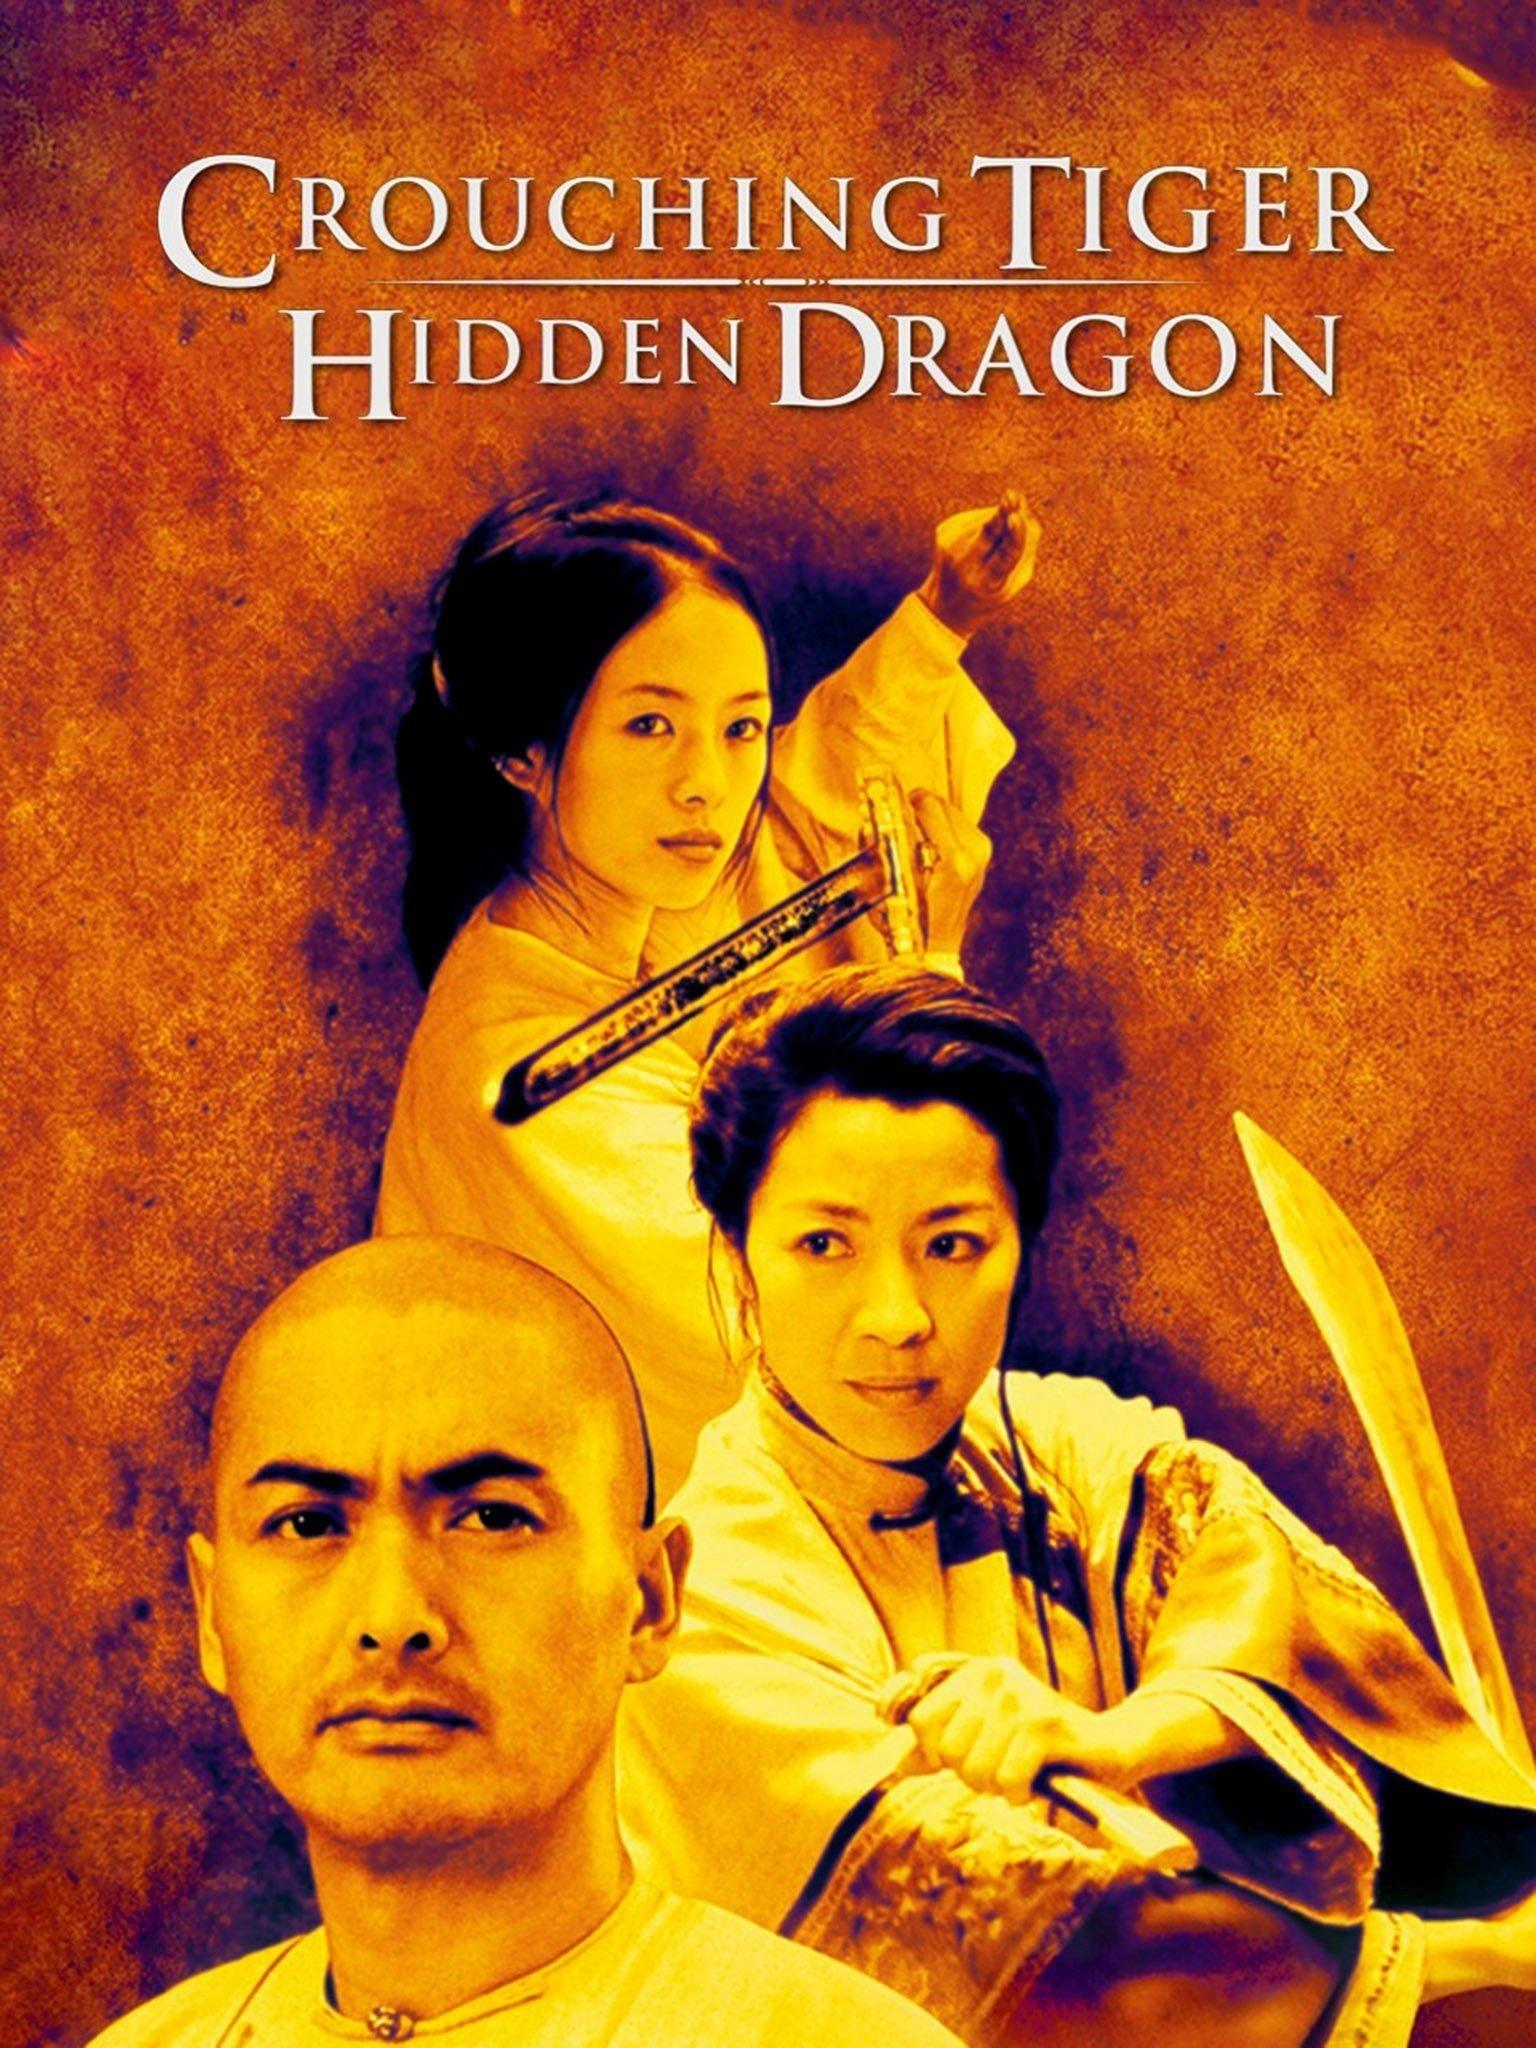 Crouching Tiger, Hidden Dragon (2000) - Rotten Tomatoes